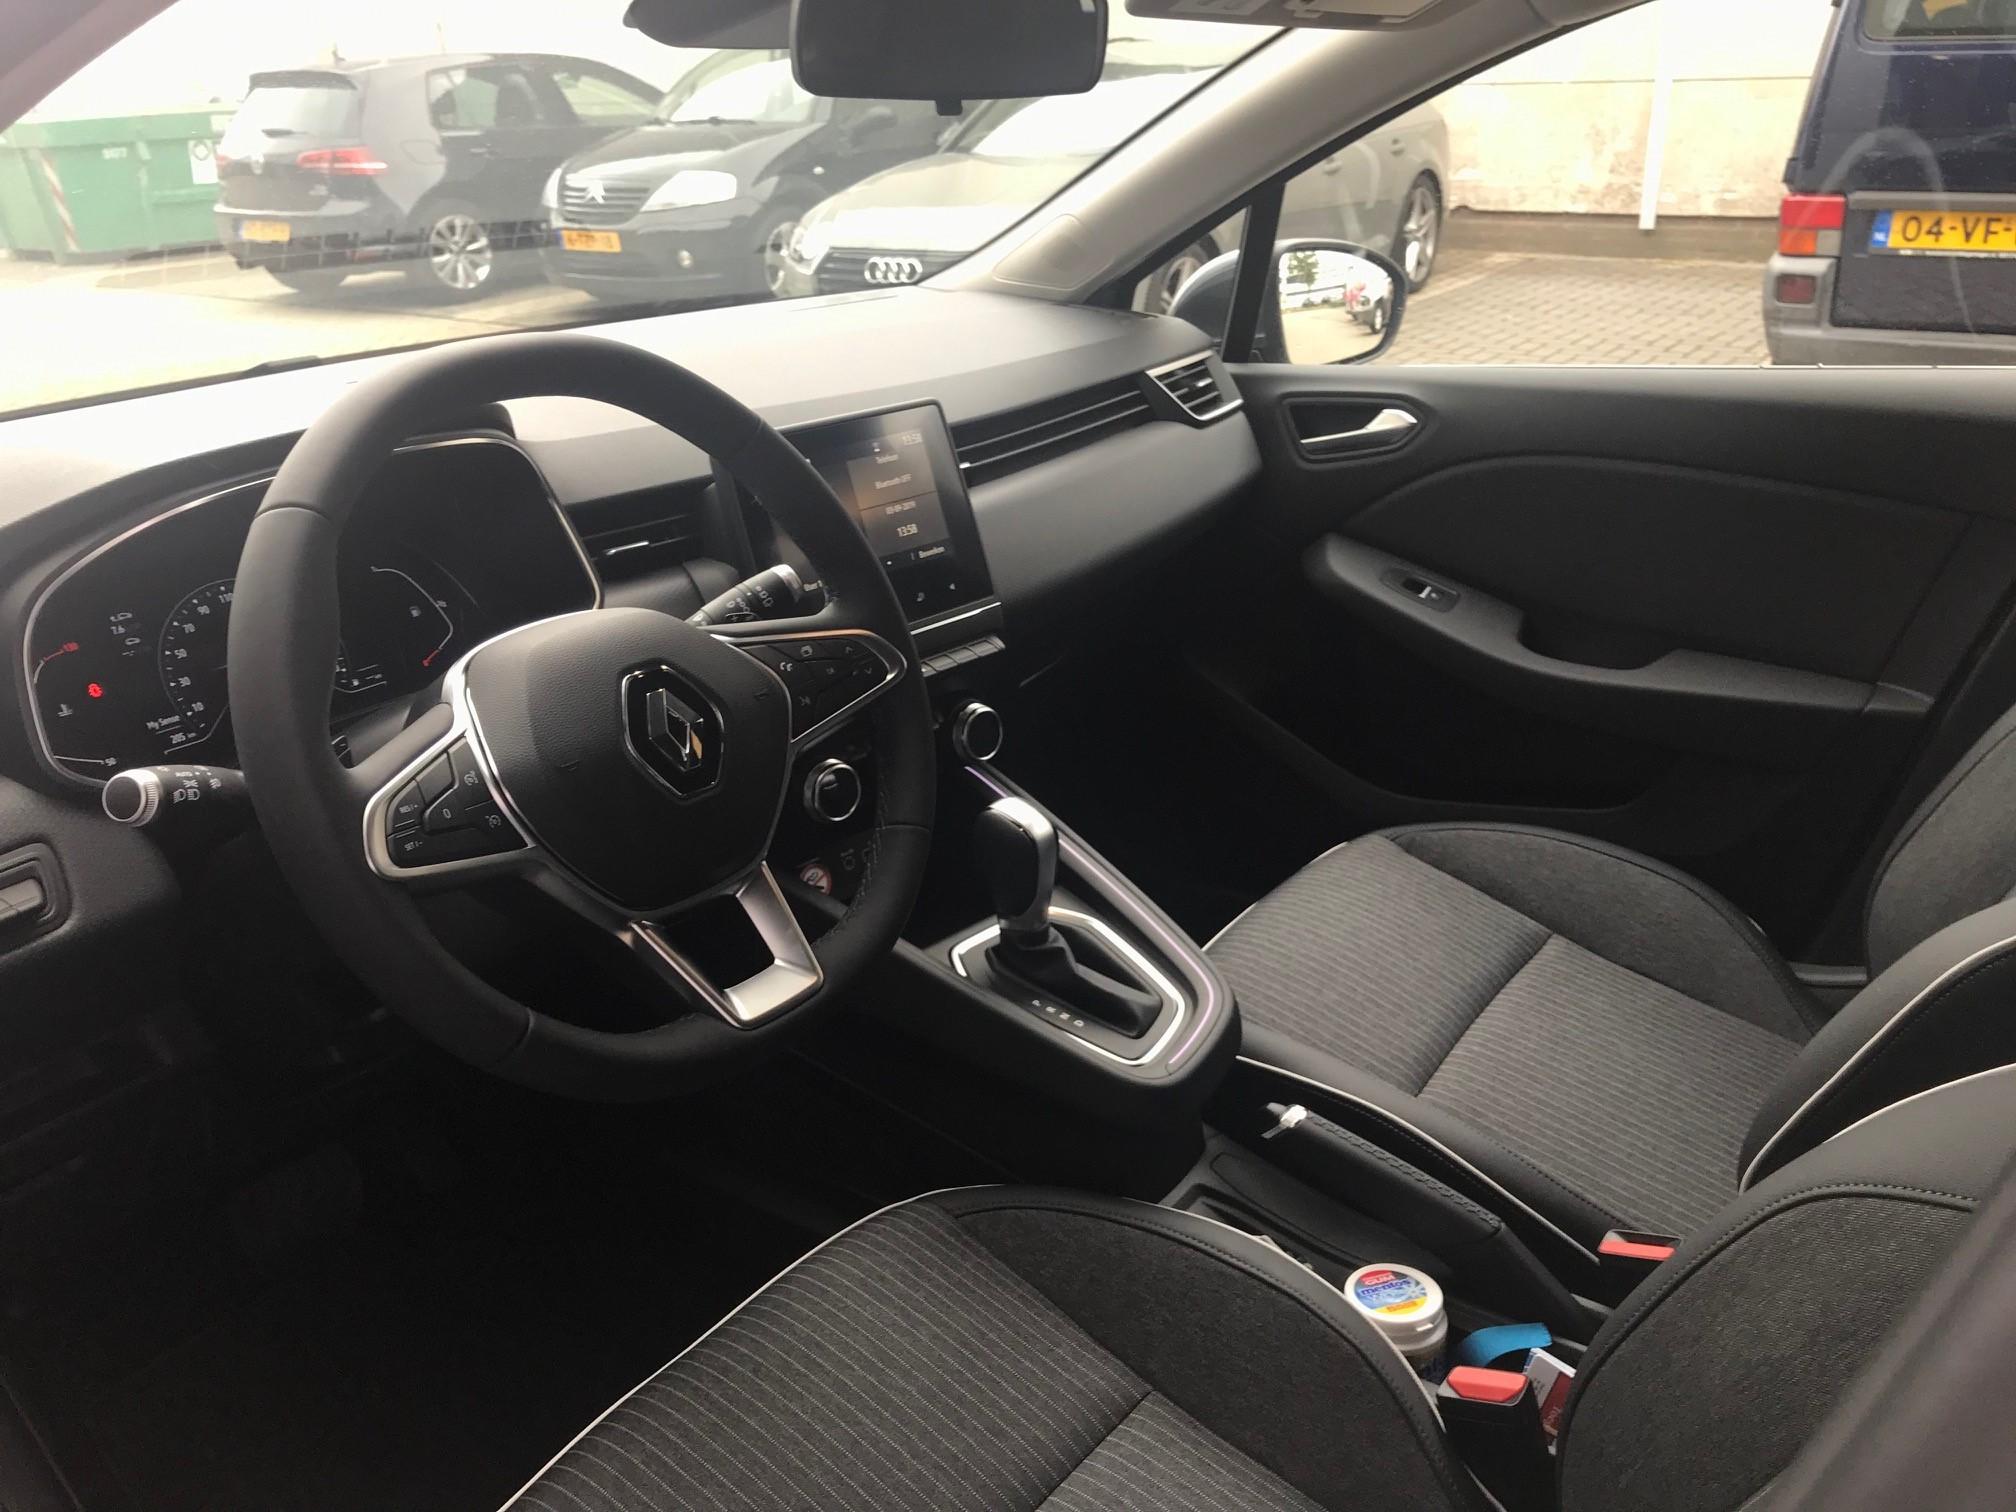 Renault Clio Intens 5 deurs